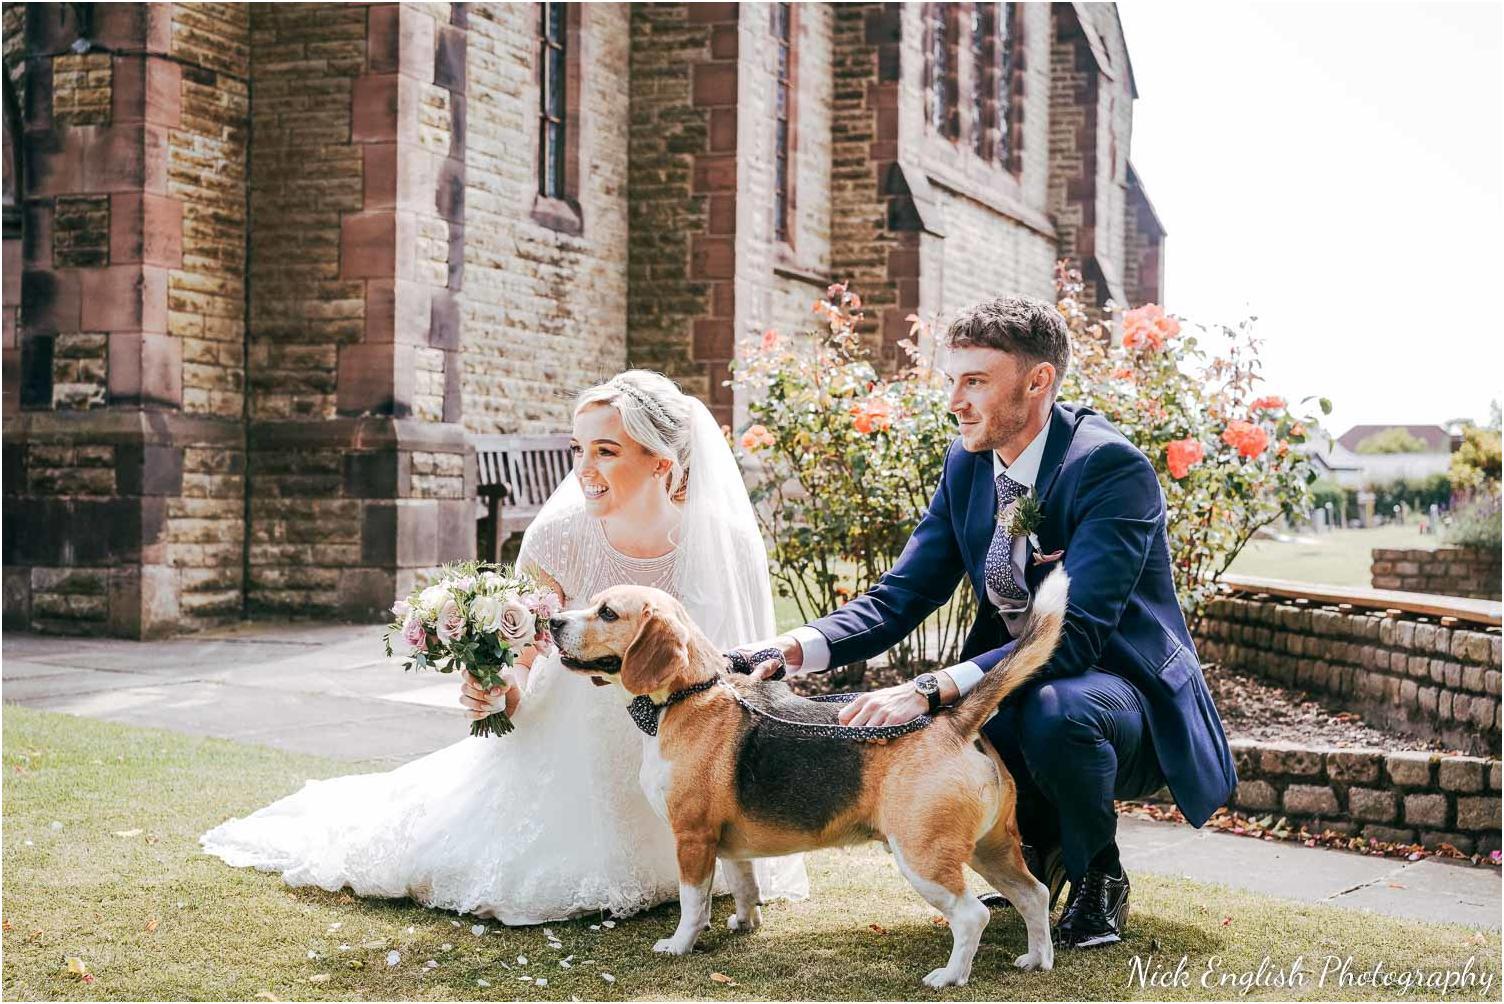 Mitton_Hall_Wedding_Photograph-58.jpg